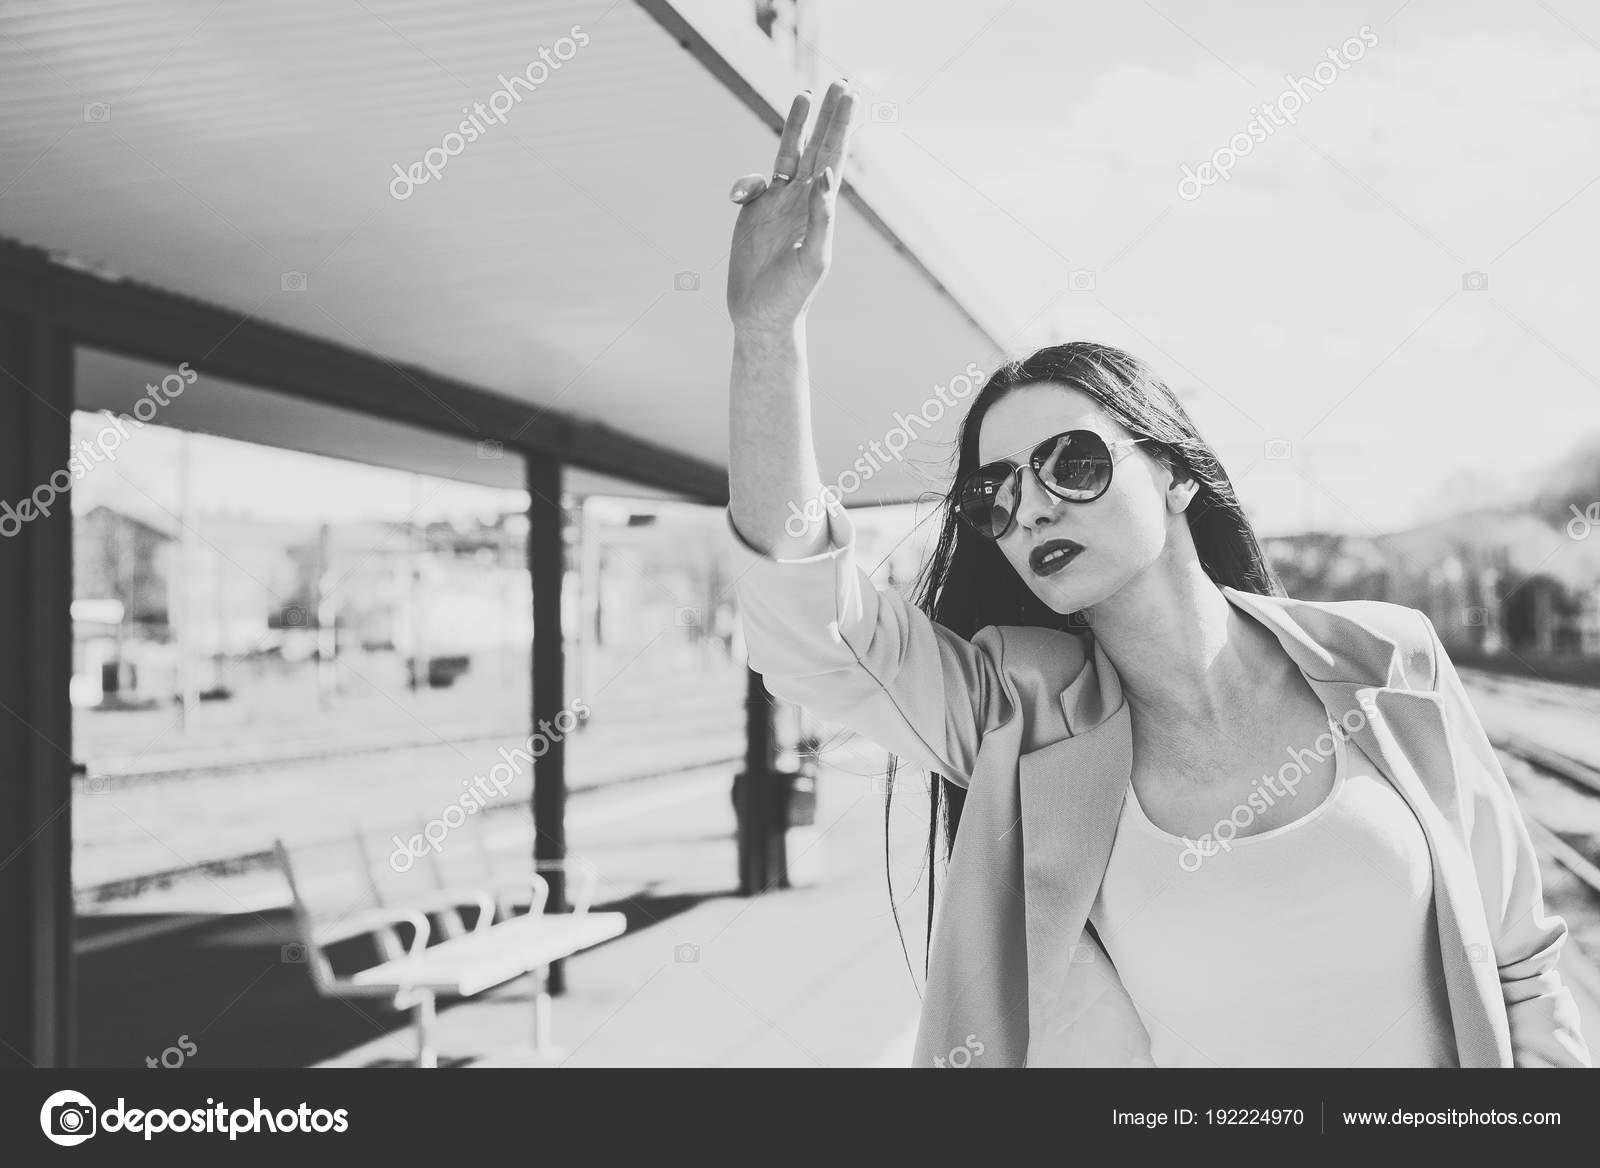 453a39551d Η γυναίκα στην πλατφόρμα θέτει το χέρι καλώντας κάποιον. Μια όμορφη και  ελκυστική γυναίκα φοράει γυαλιά ηλίου. Ταξίδια έννοια